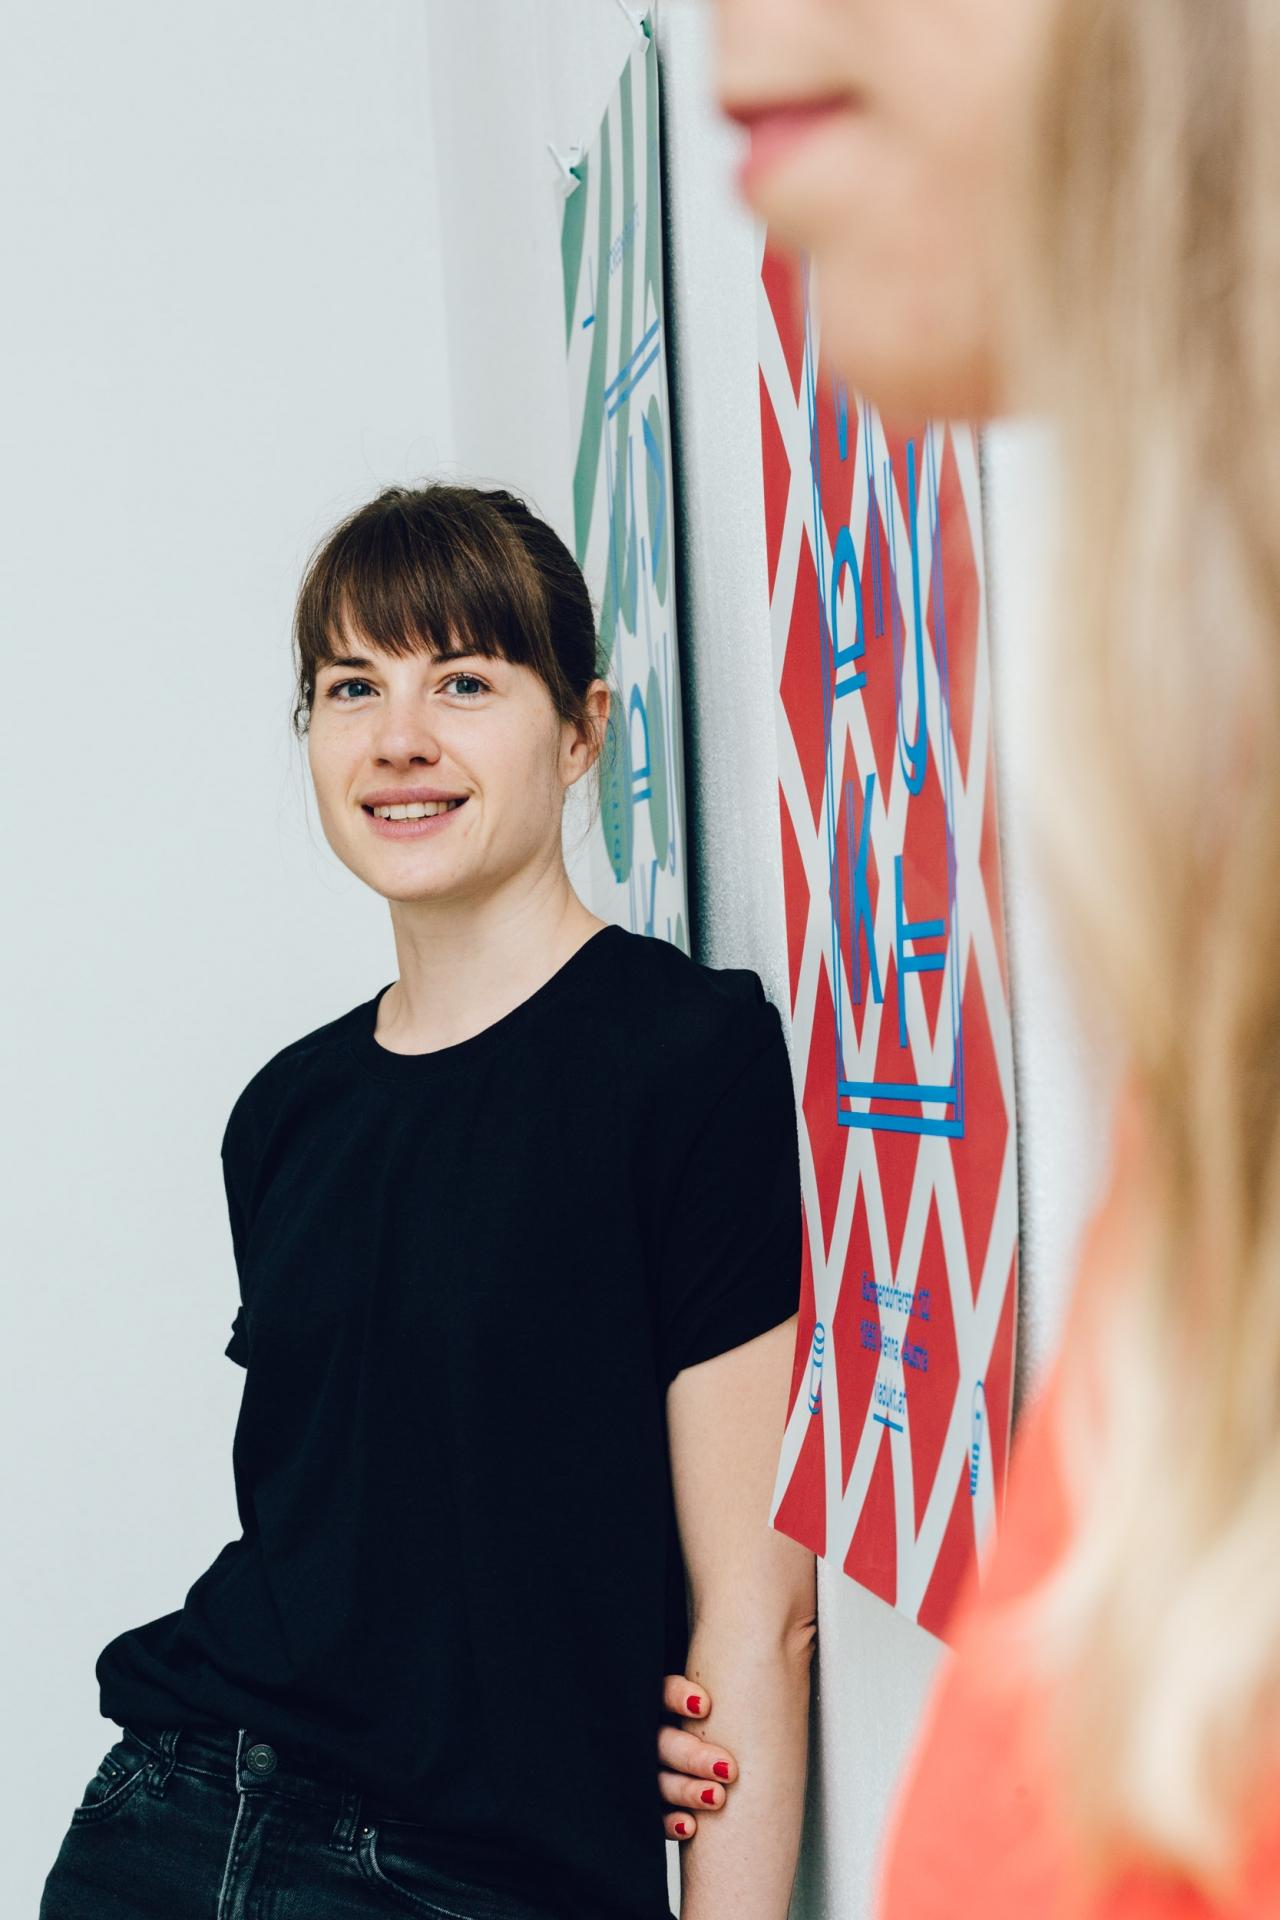 Helga Traxler Studioportrait VIADUKT STREENPRINTS Vienna